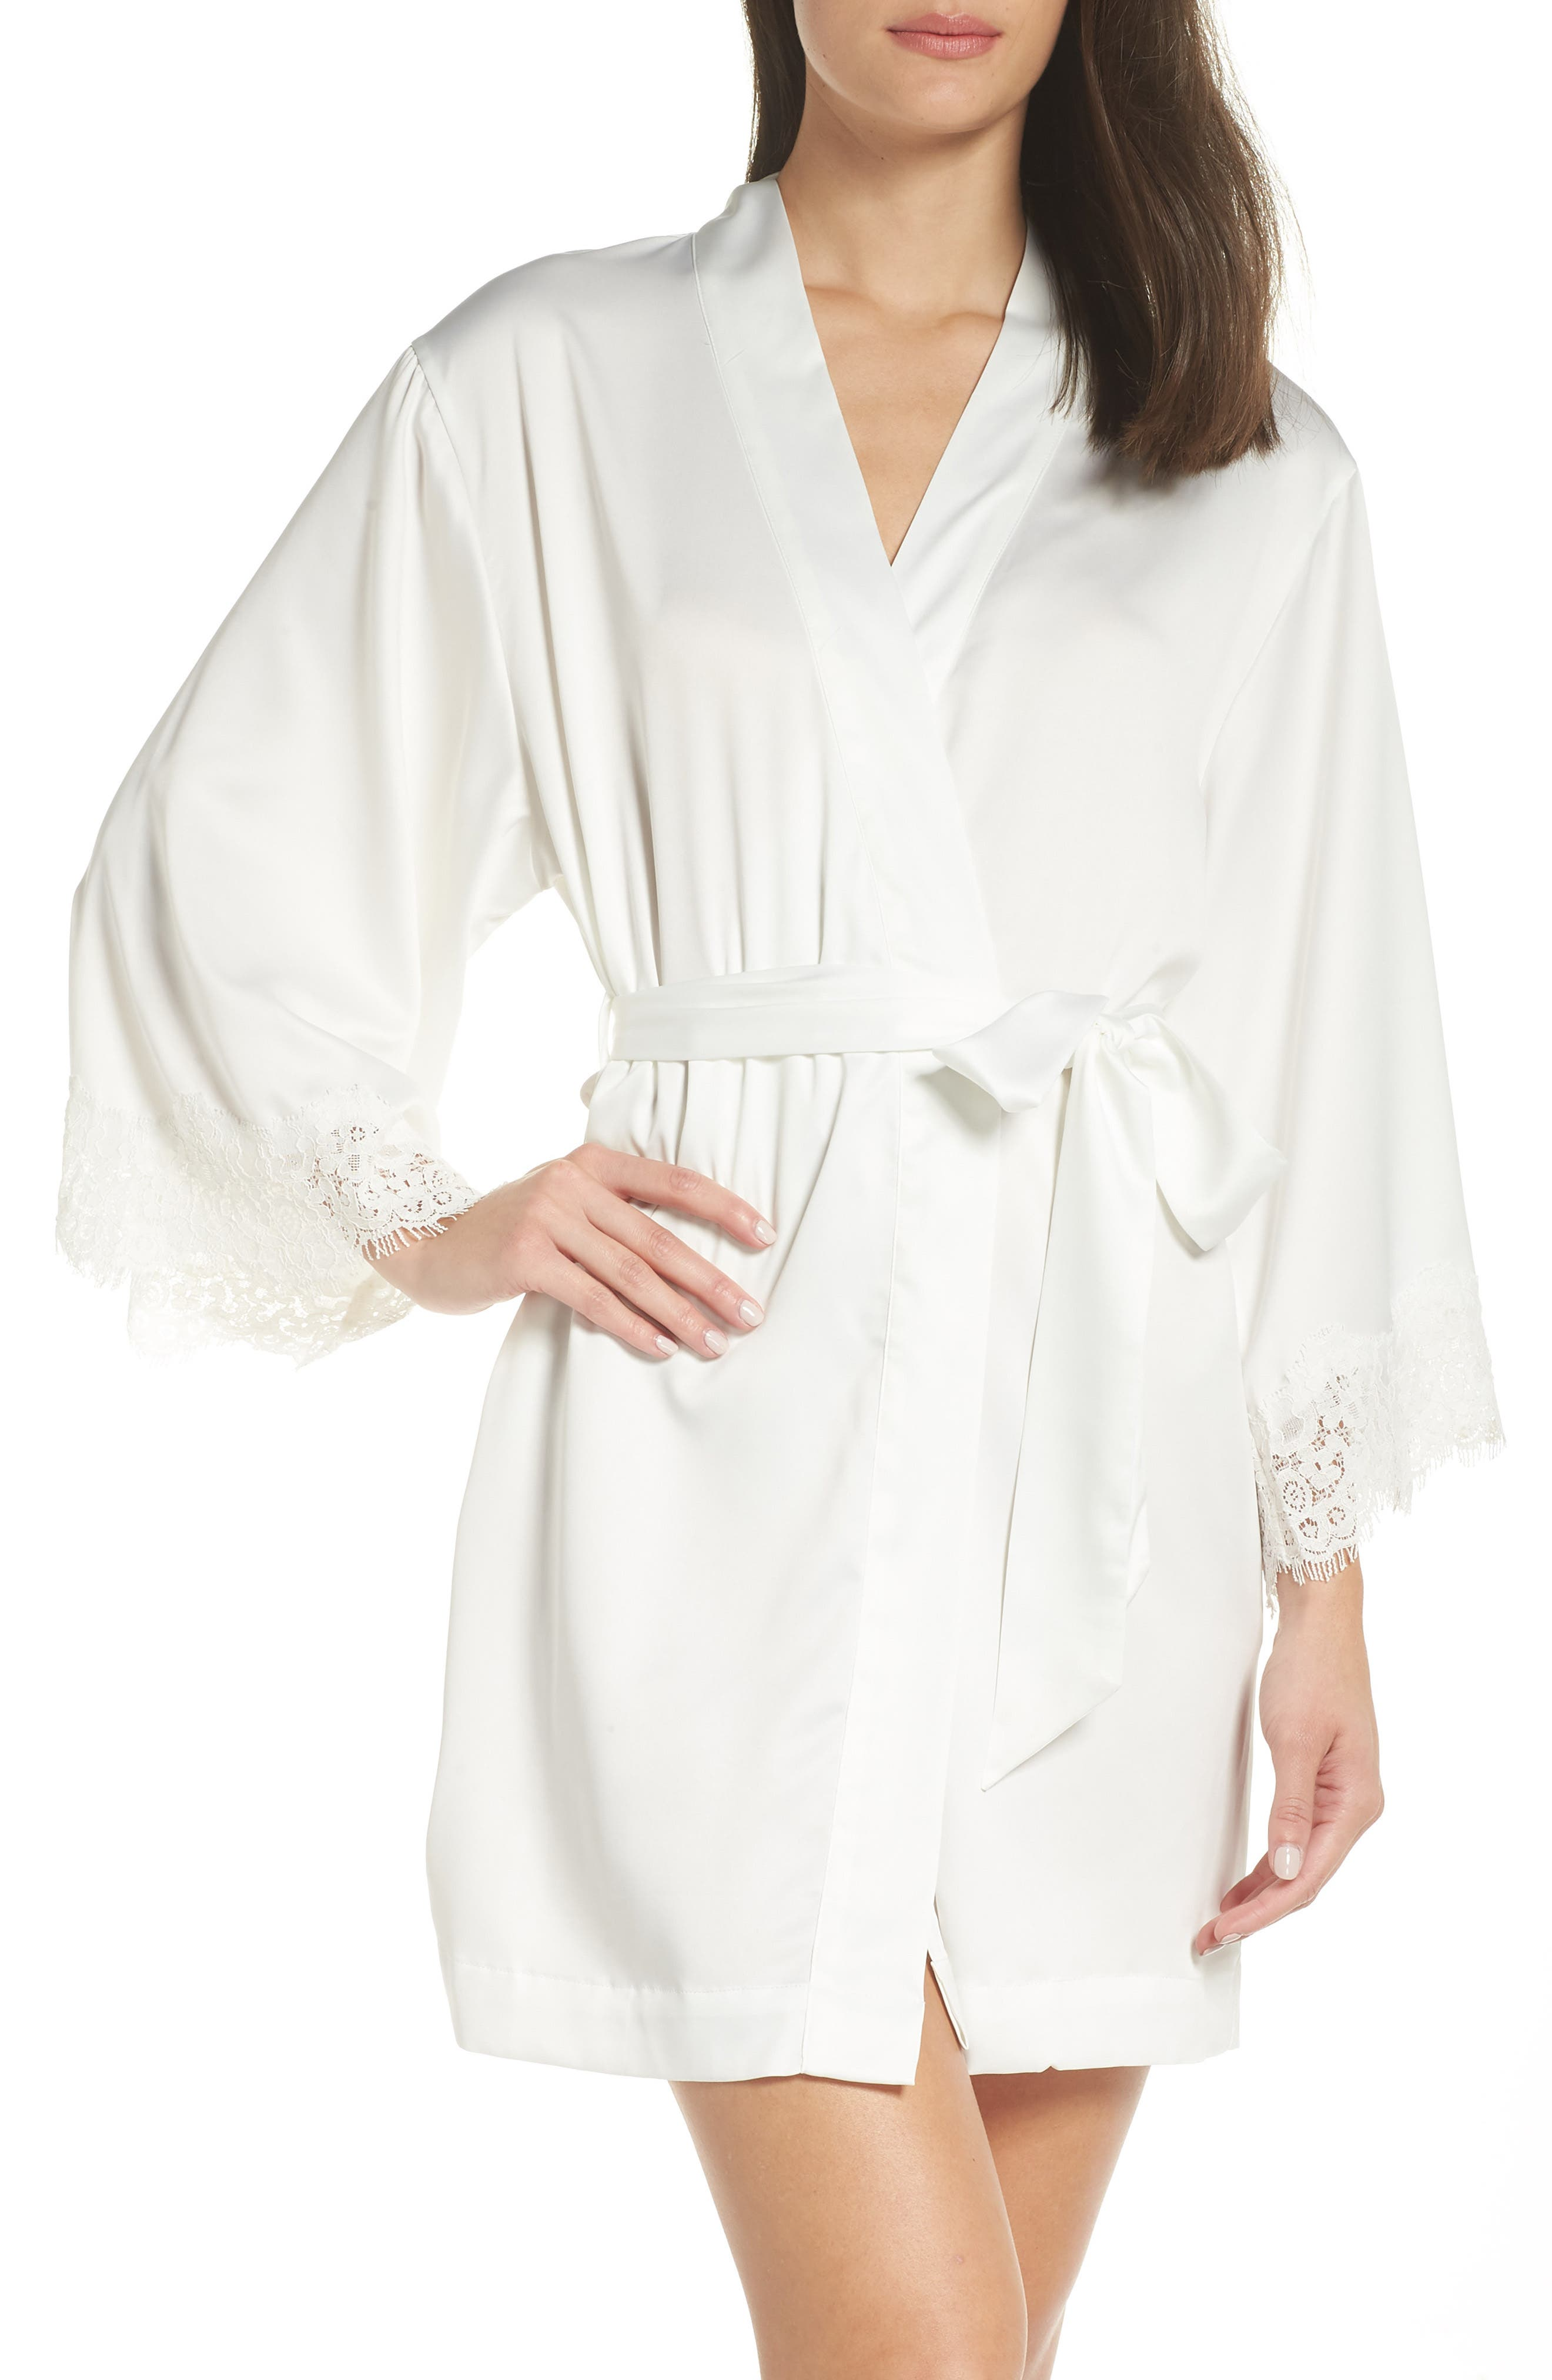 HOMEBODII Juliette Short Satin Robe in White